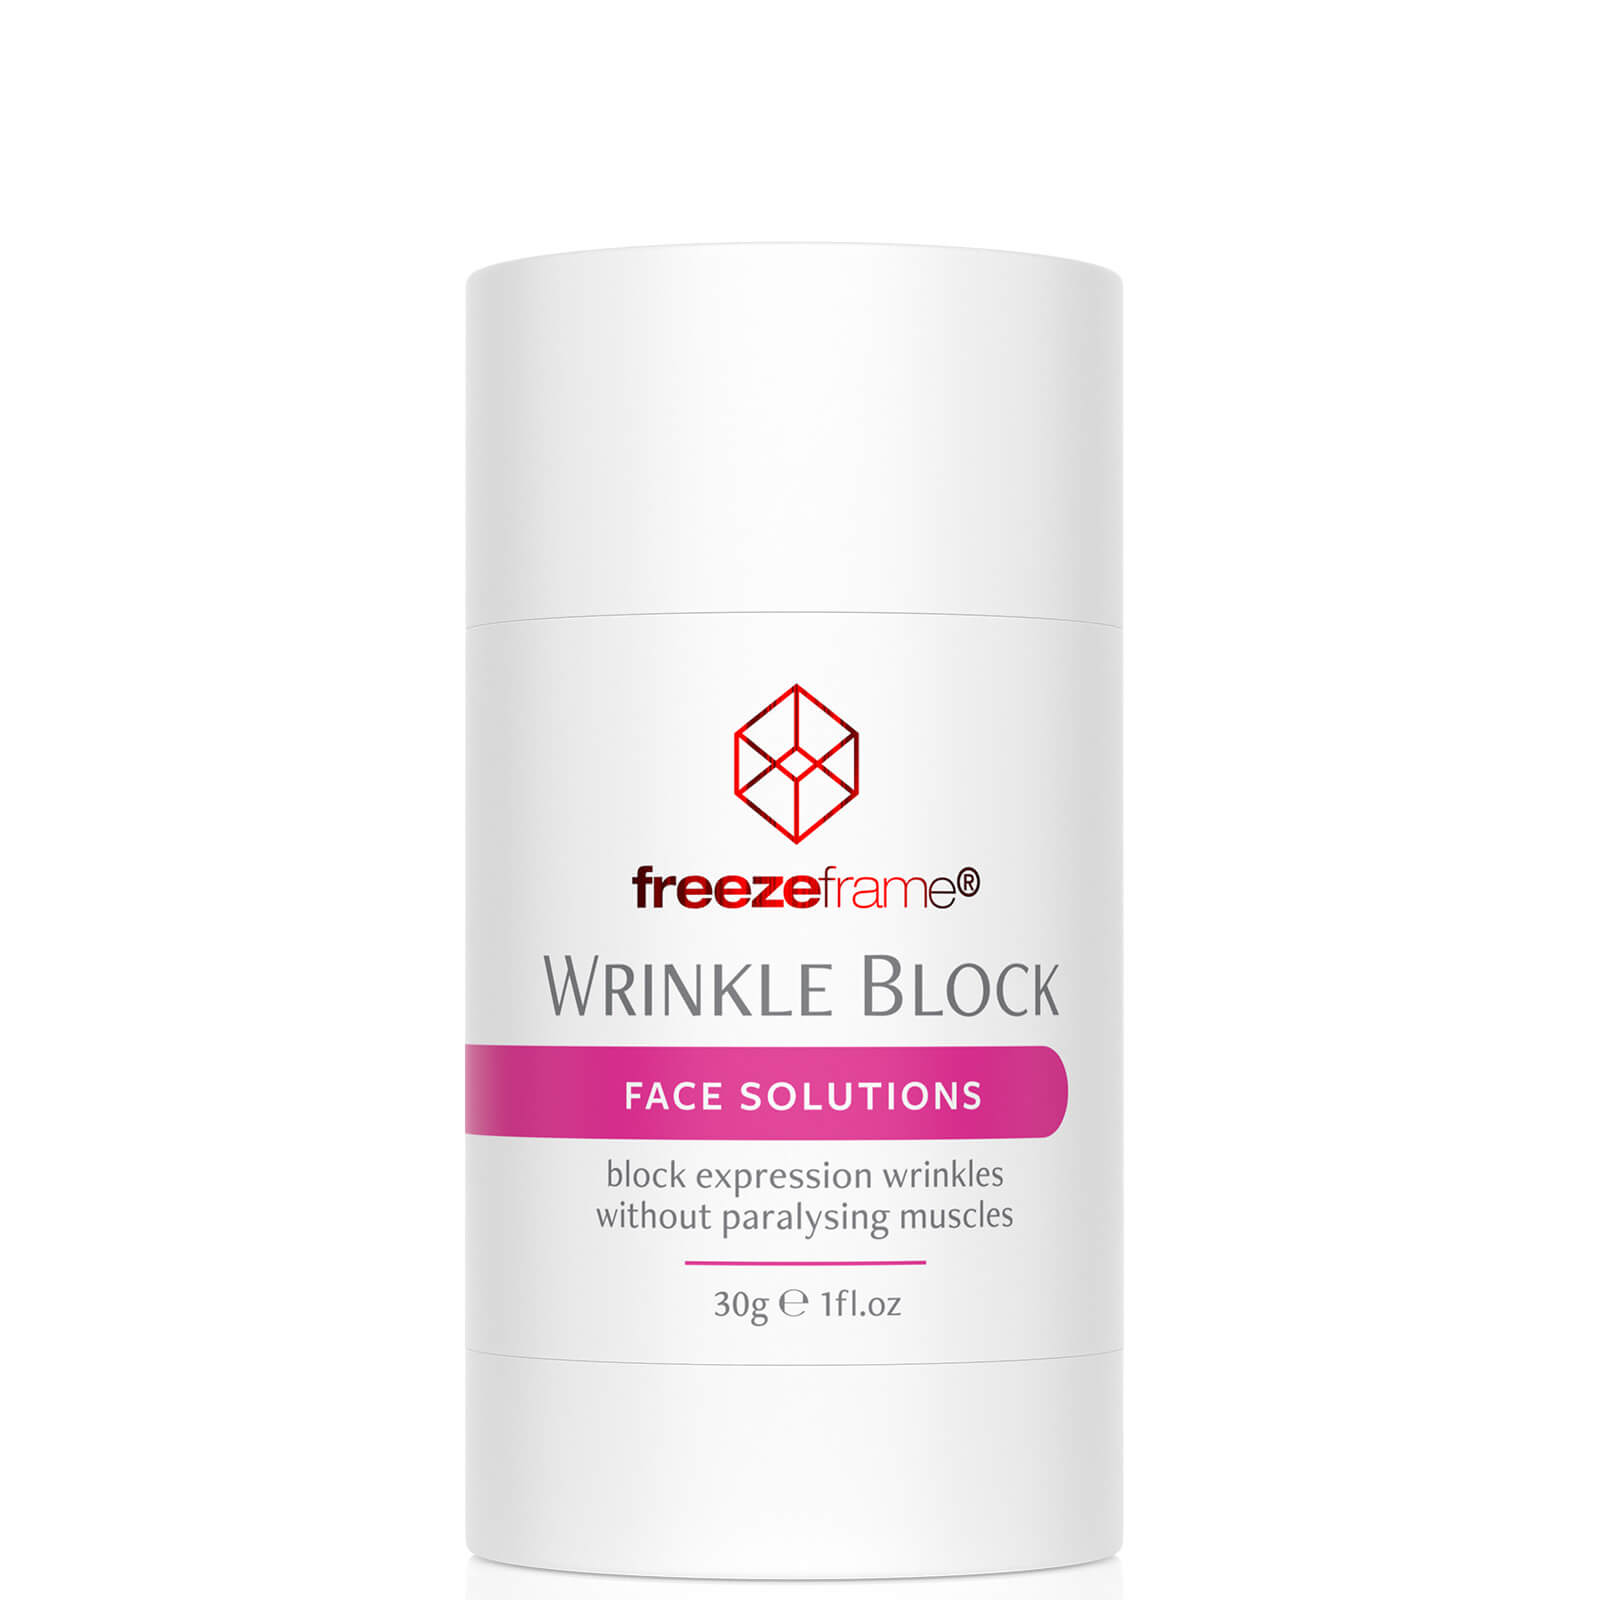 freezeframe Wrinkle Block 50ml